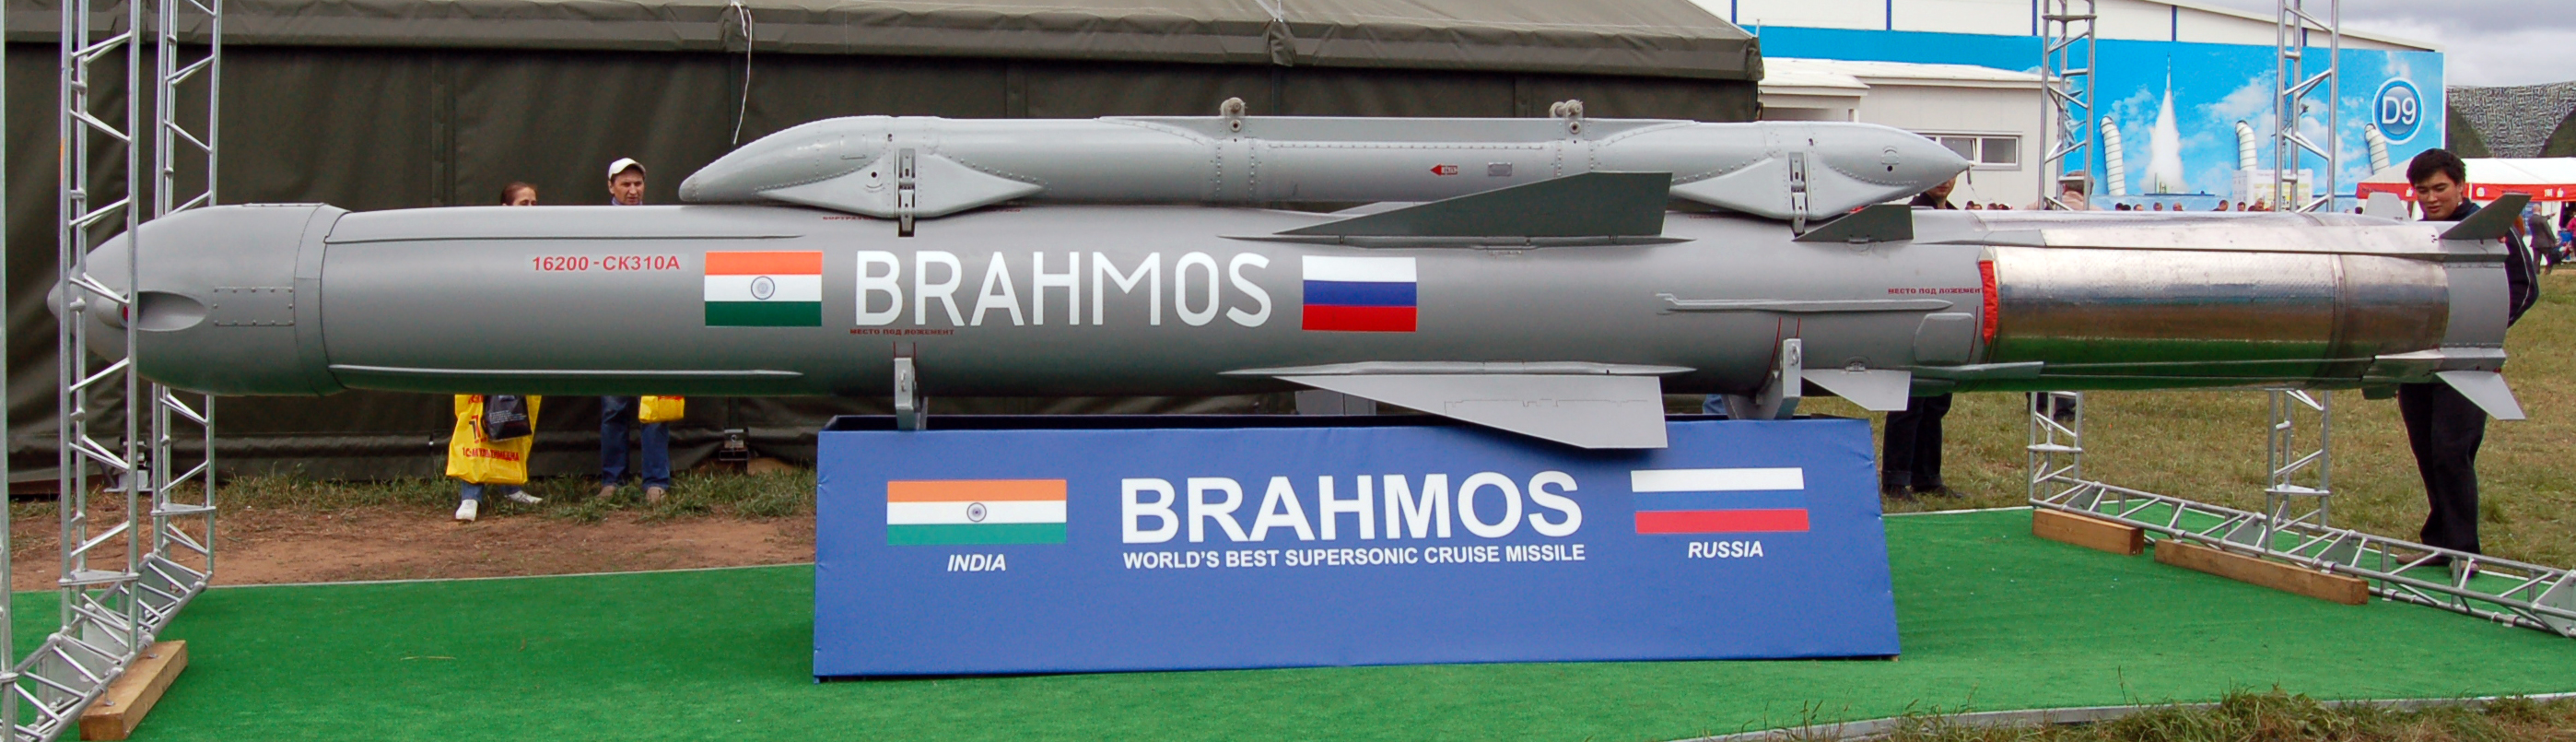 File:BrahMos MAKS2009.jpg - Wikimedia Commons